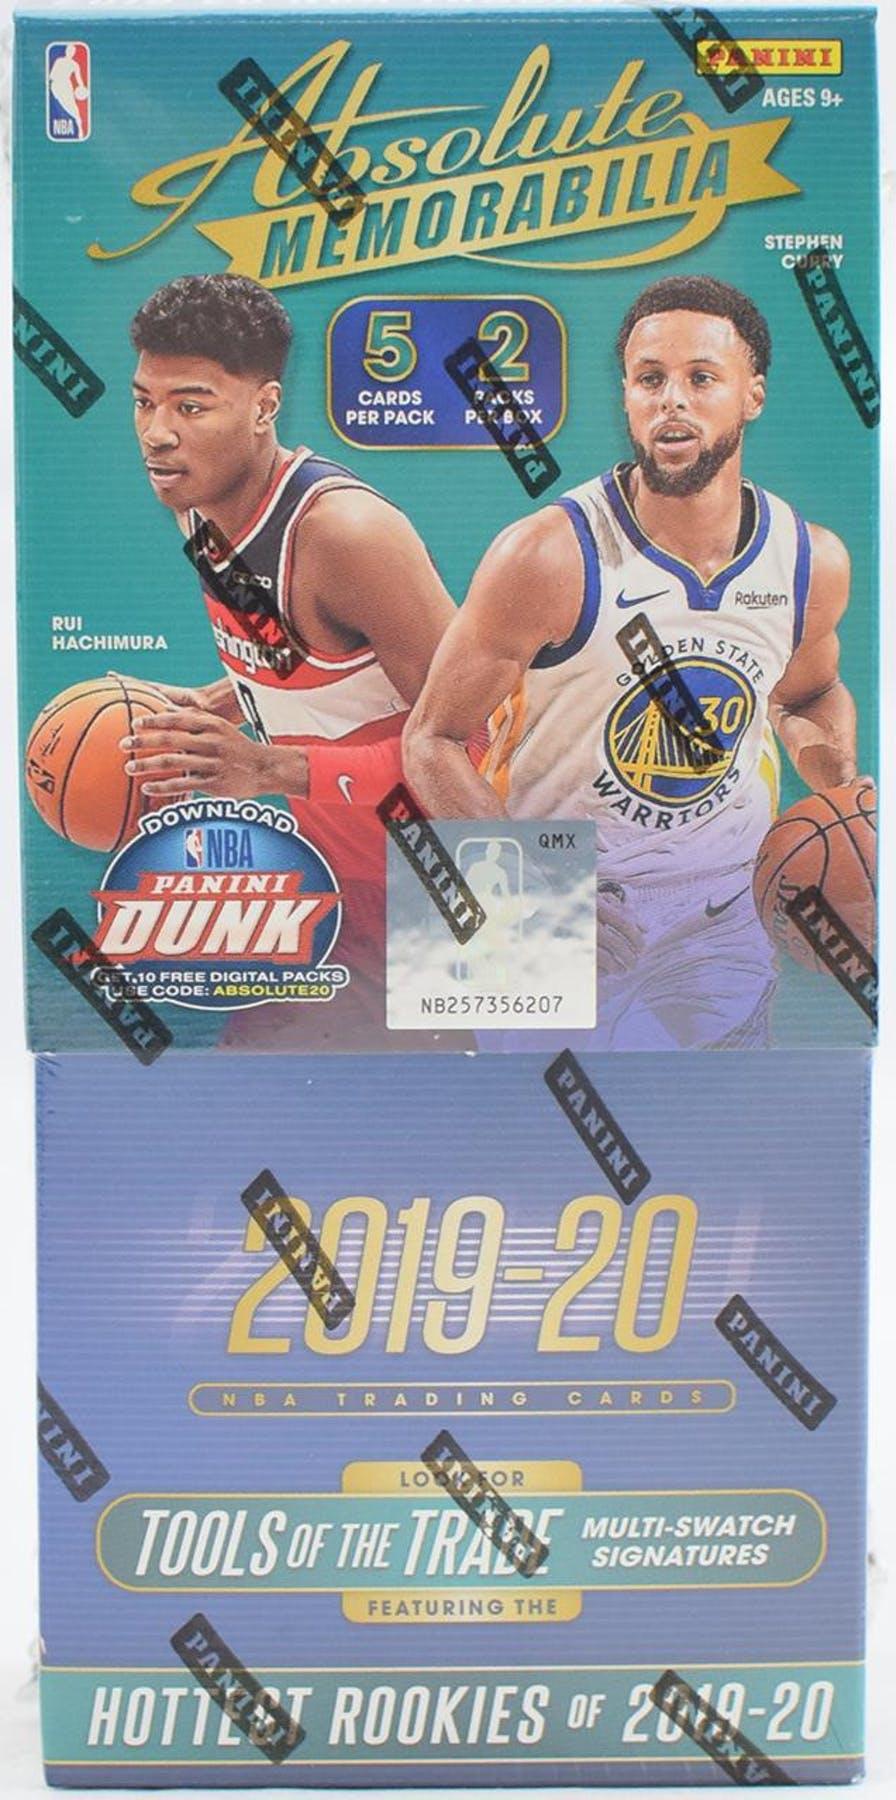 201920 basketball  panini absolute memorabilia p5b2